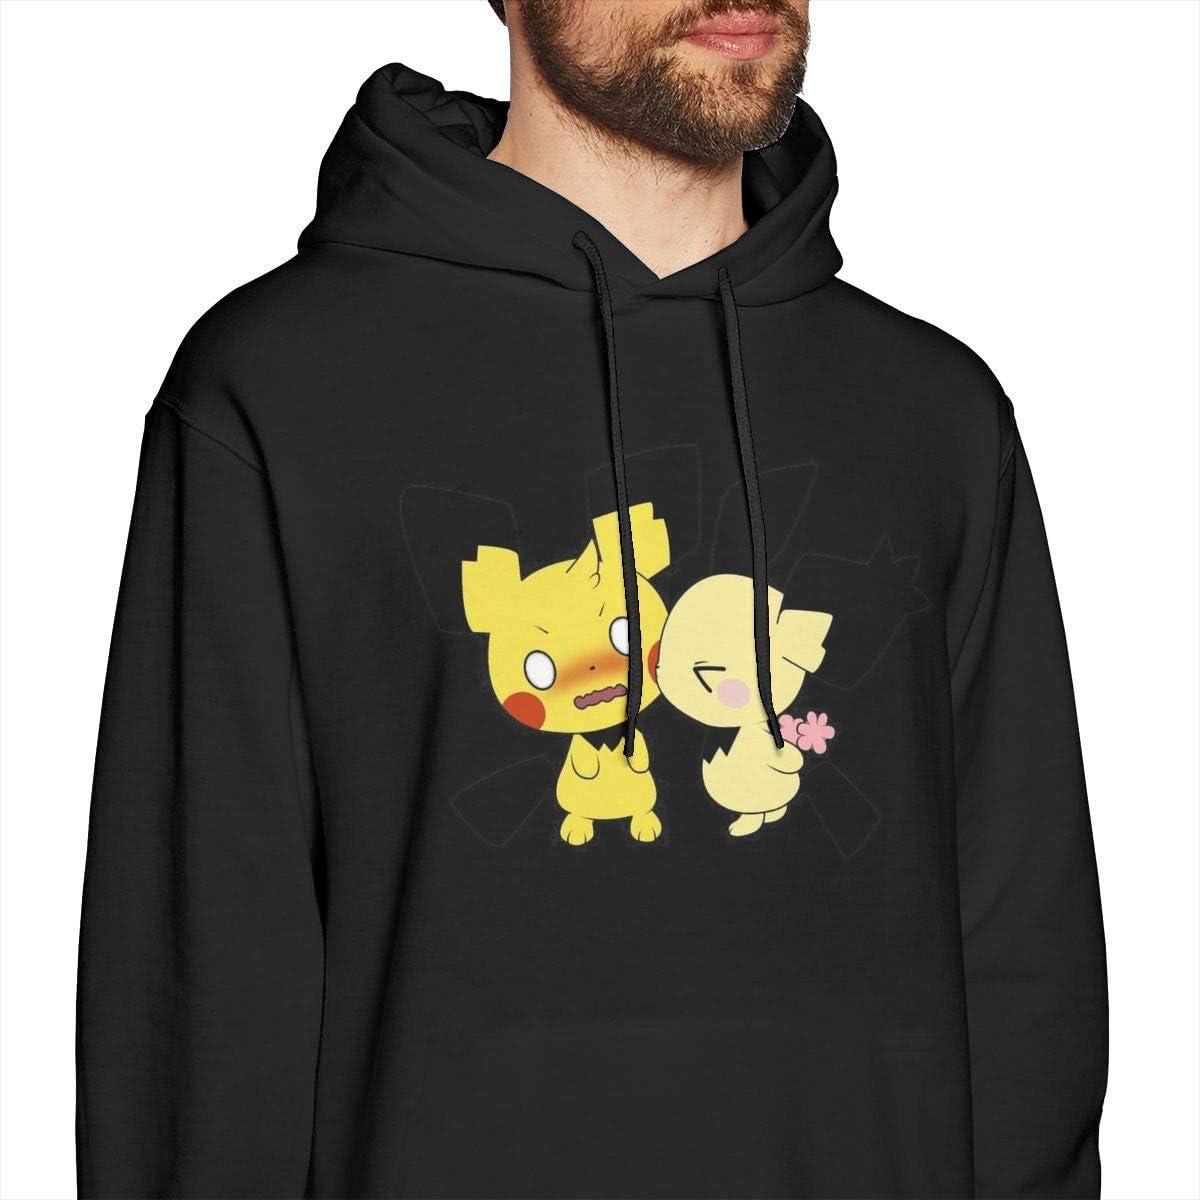 shotngwu All I Want for Christmas is Chu Pikachu Knit Pattern Mens Pullover Hoodies Crewneck Long Sleeve Sweatshirt Black Large|style2